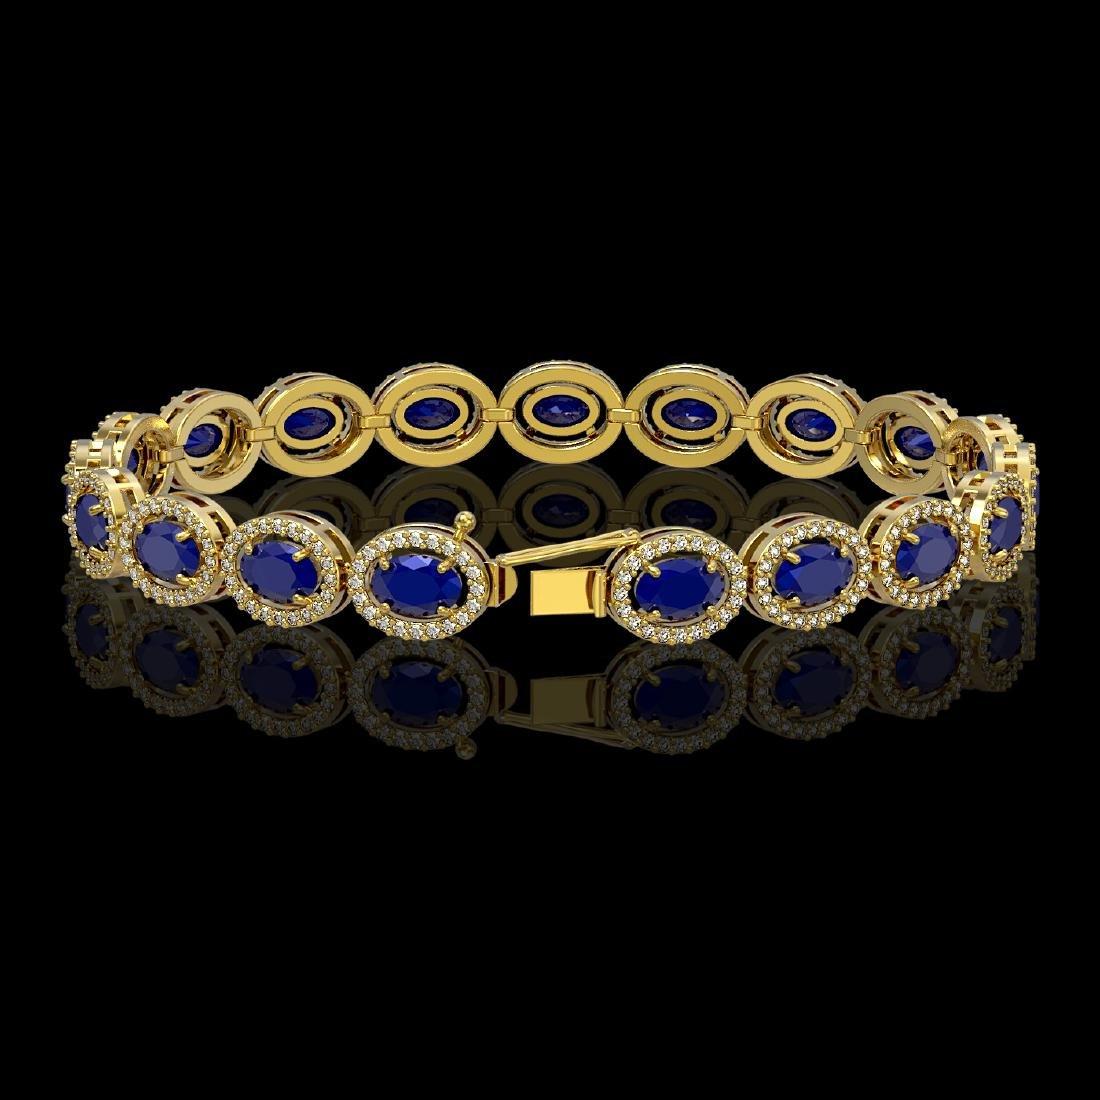 15.2 CTW Sapphire & Diamond Halo Bracelet 10K Yellow - 2